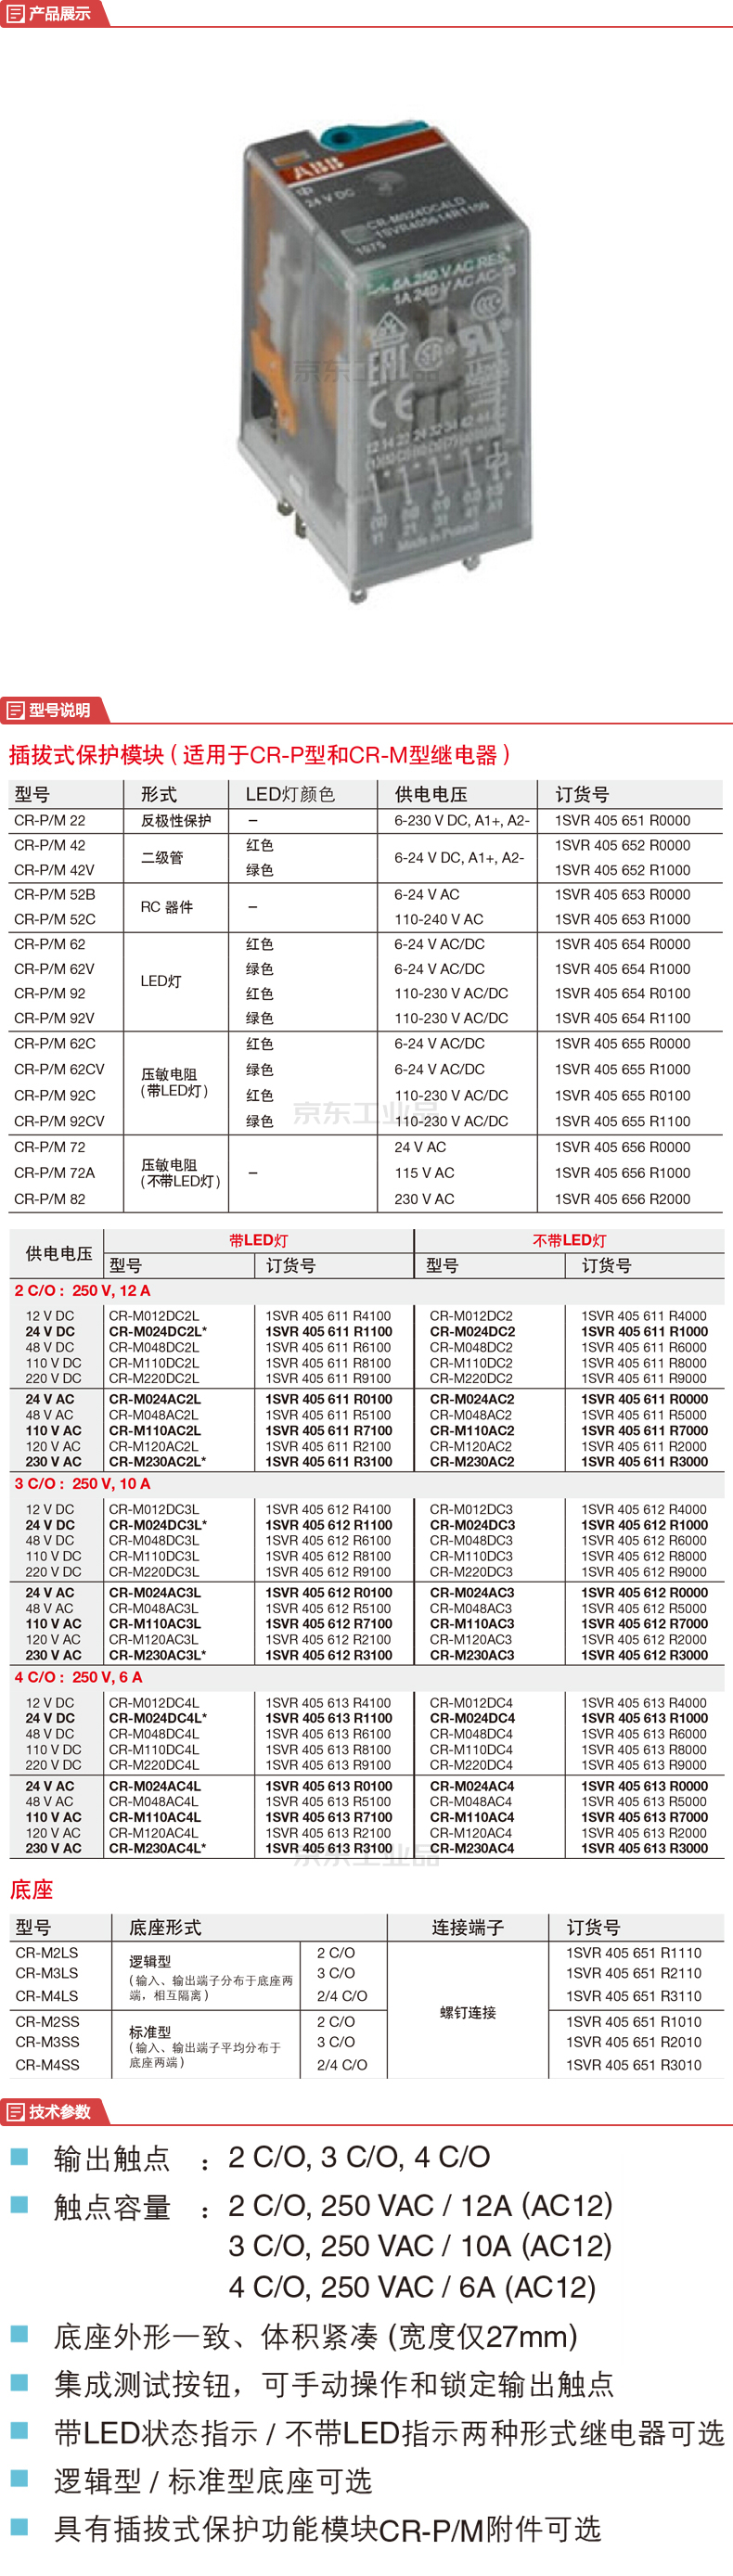 ABB 微型插拔式接口继电器;CR-M012DC4L